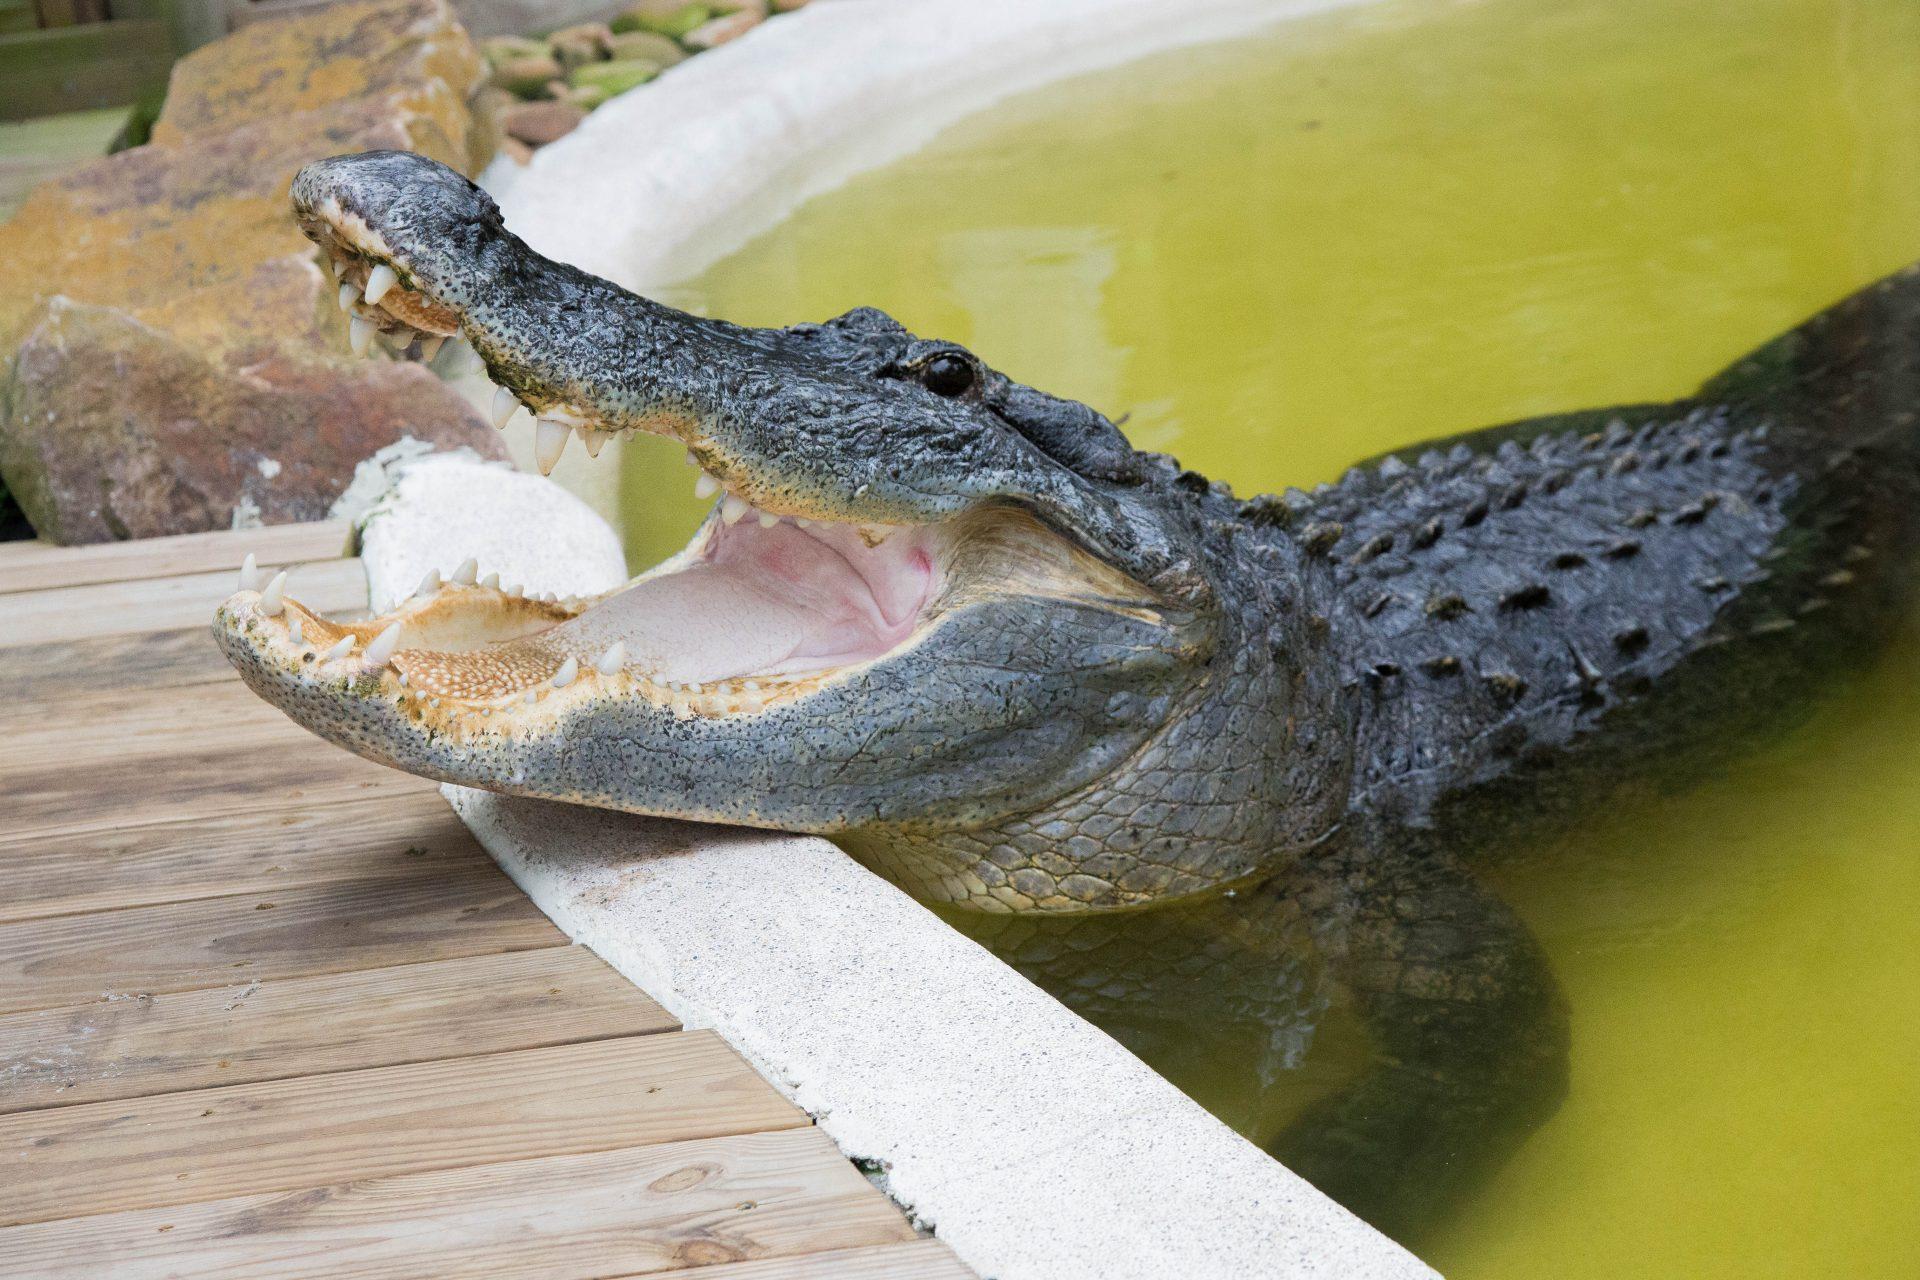 Wild Florida animal